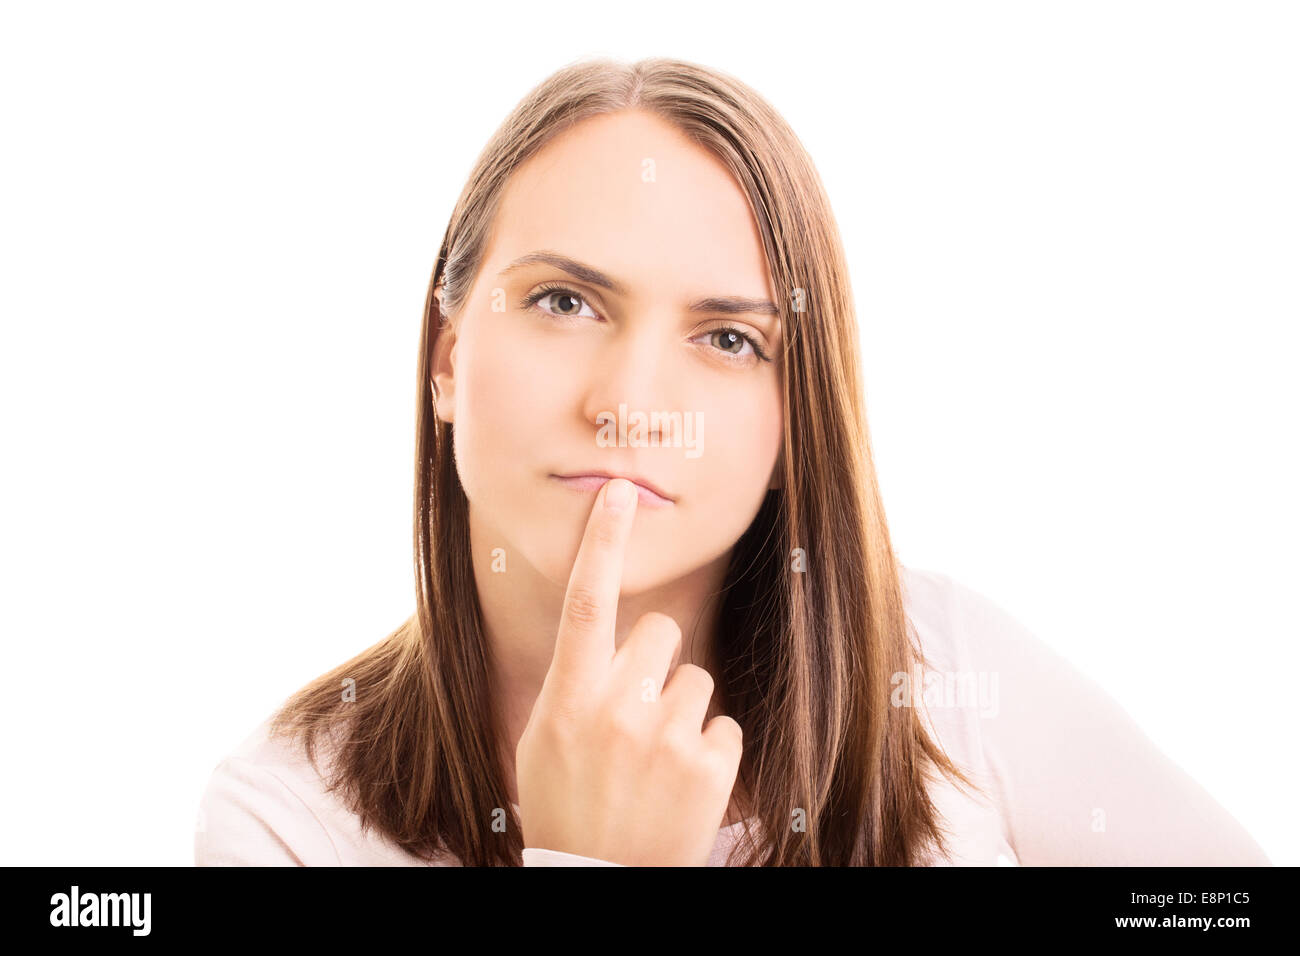 Close-up shot of young girl thinking of something isolated on white background - Stock Image